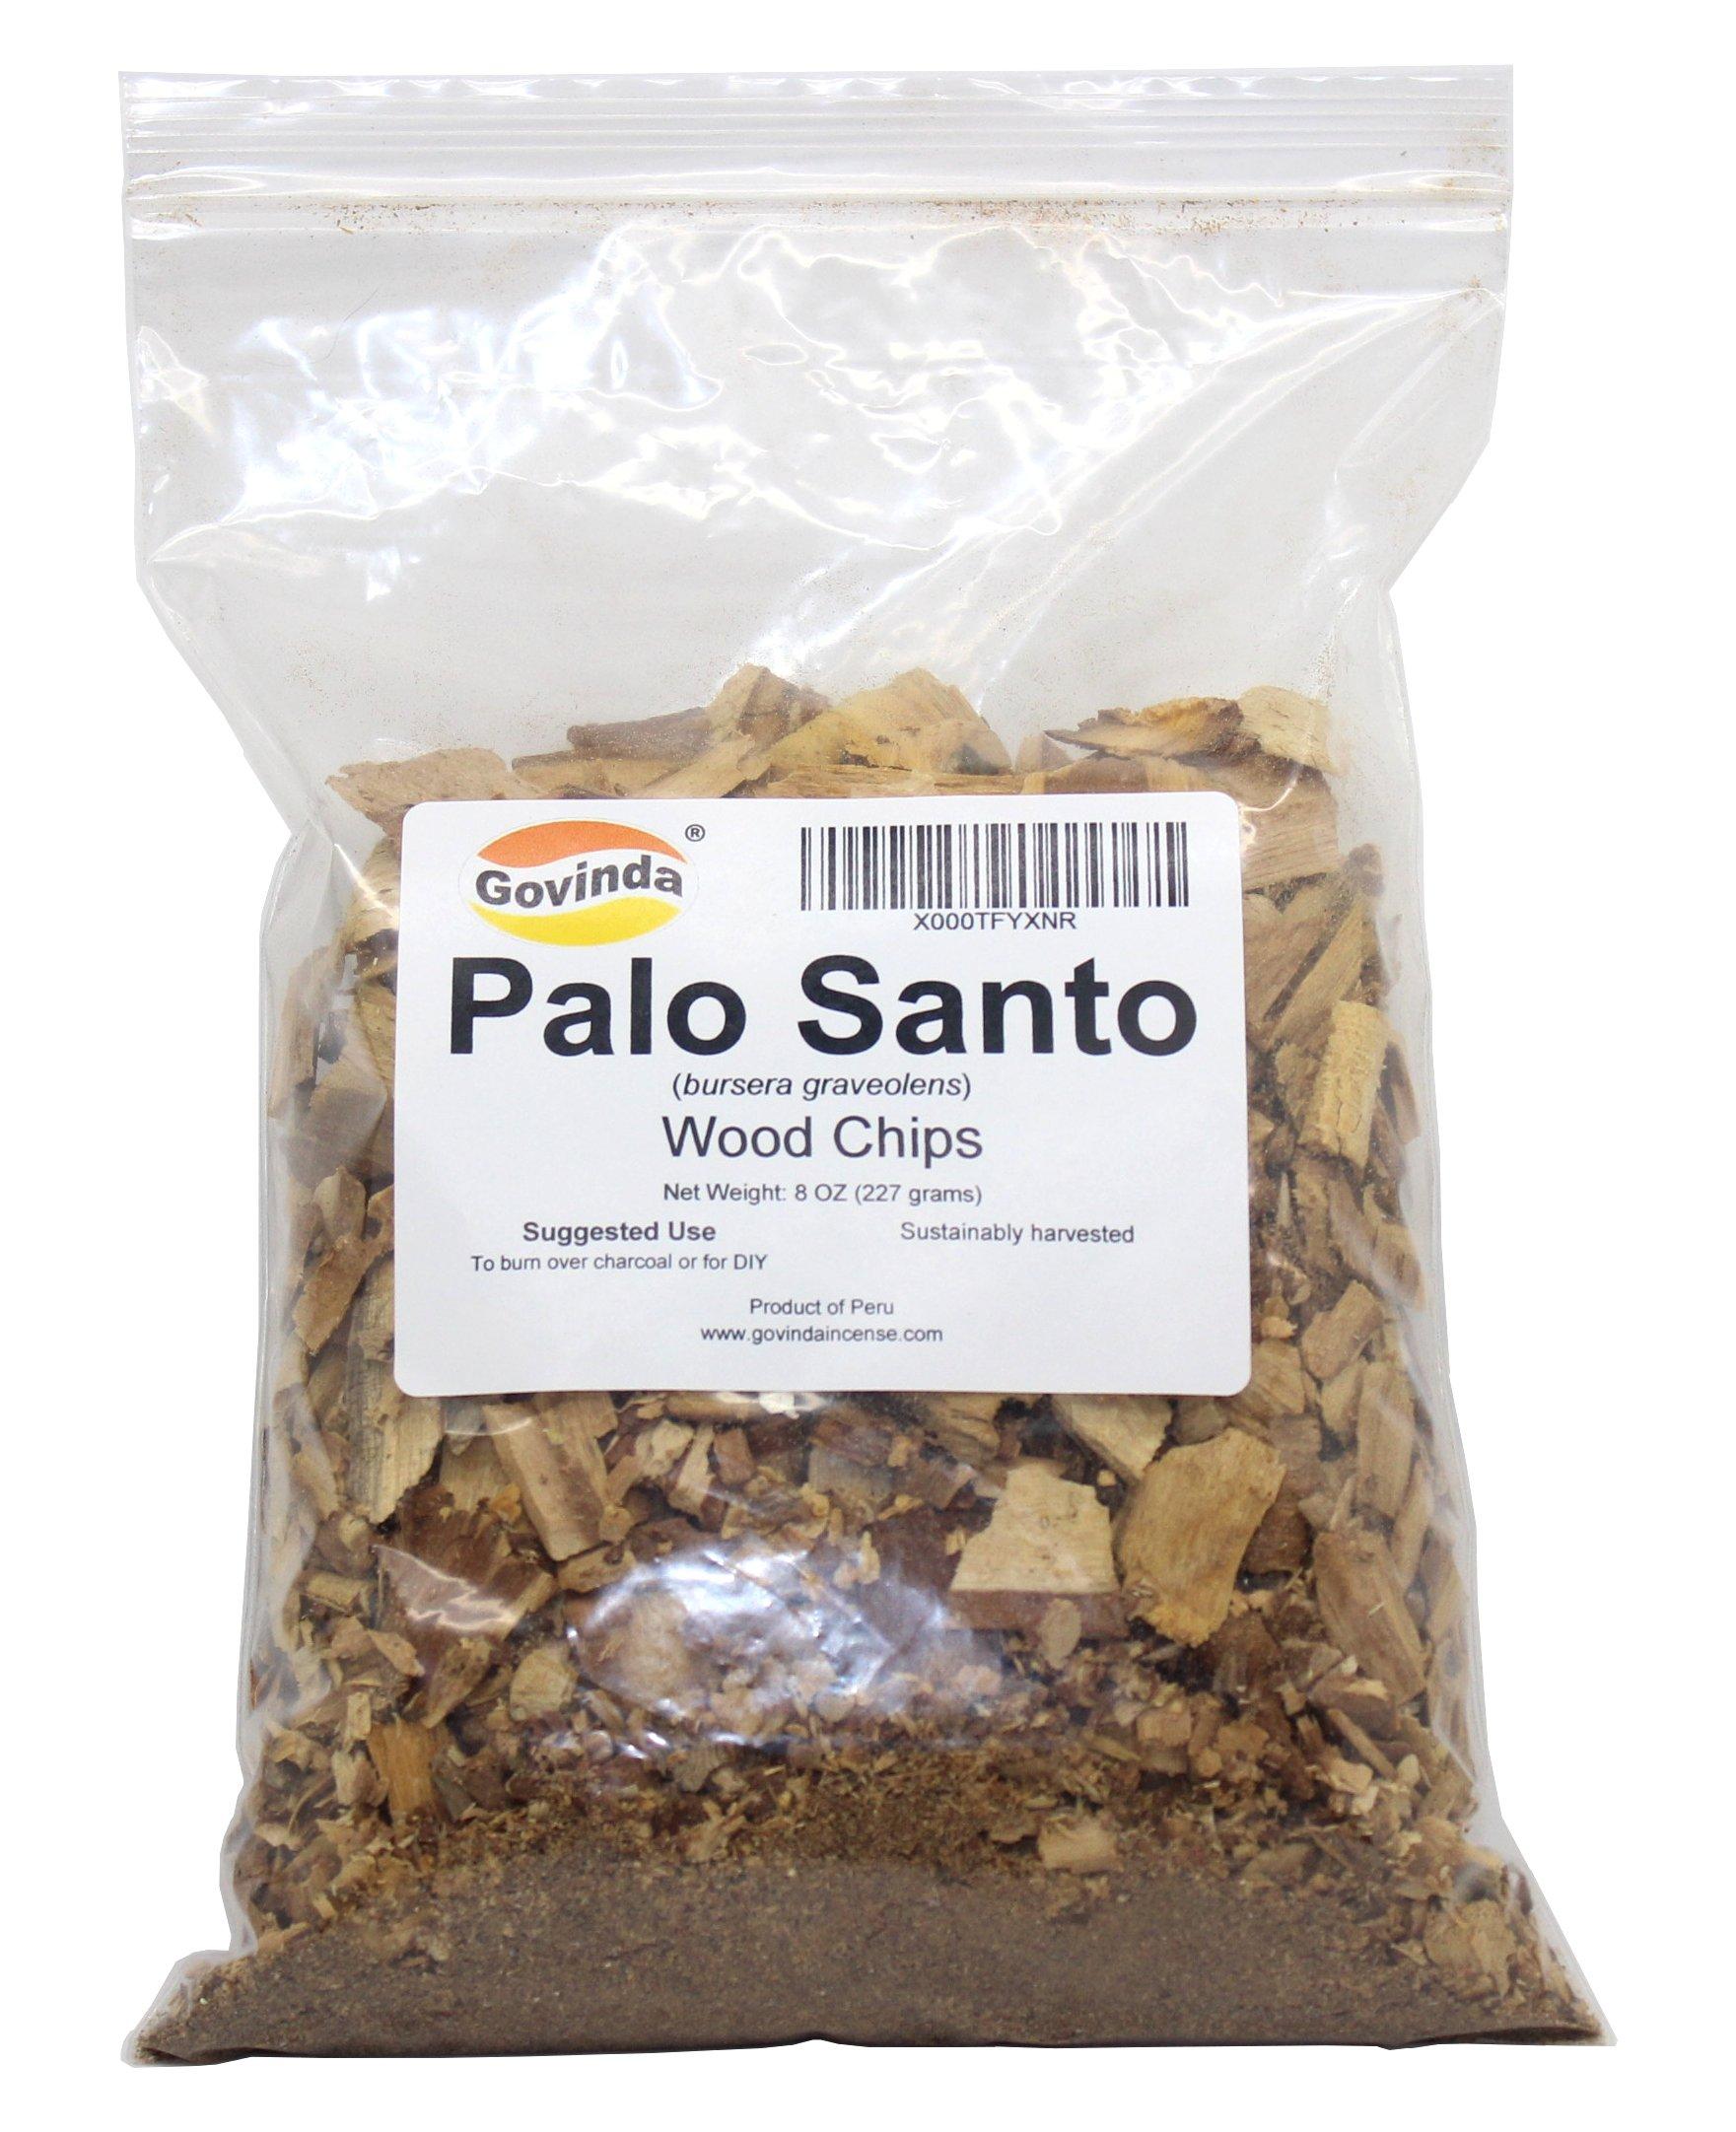 Govinda Palo Santo Wood Chips, 8 Oz